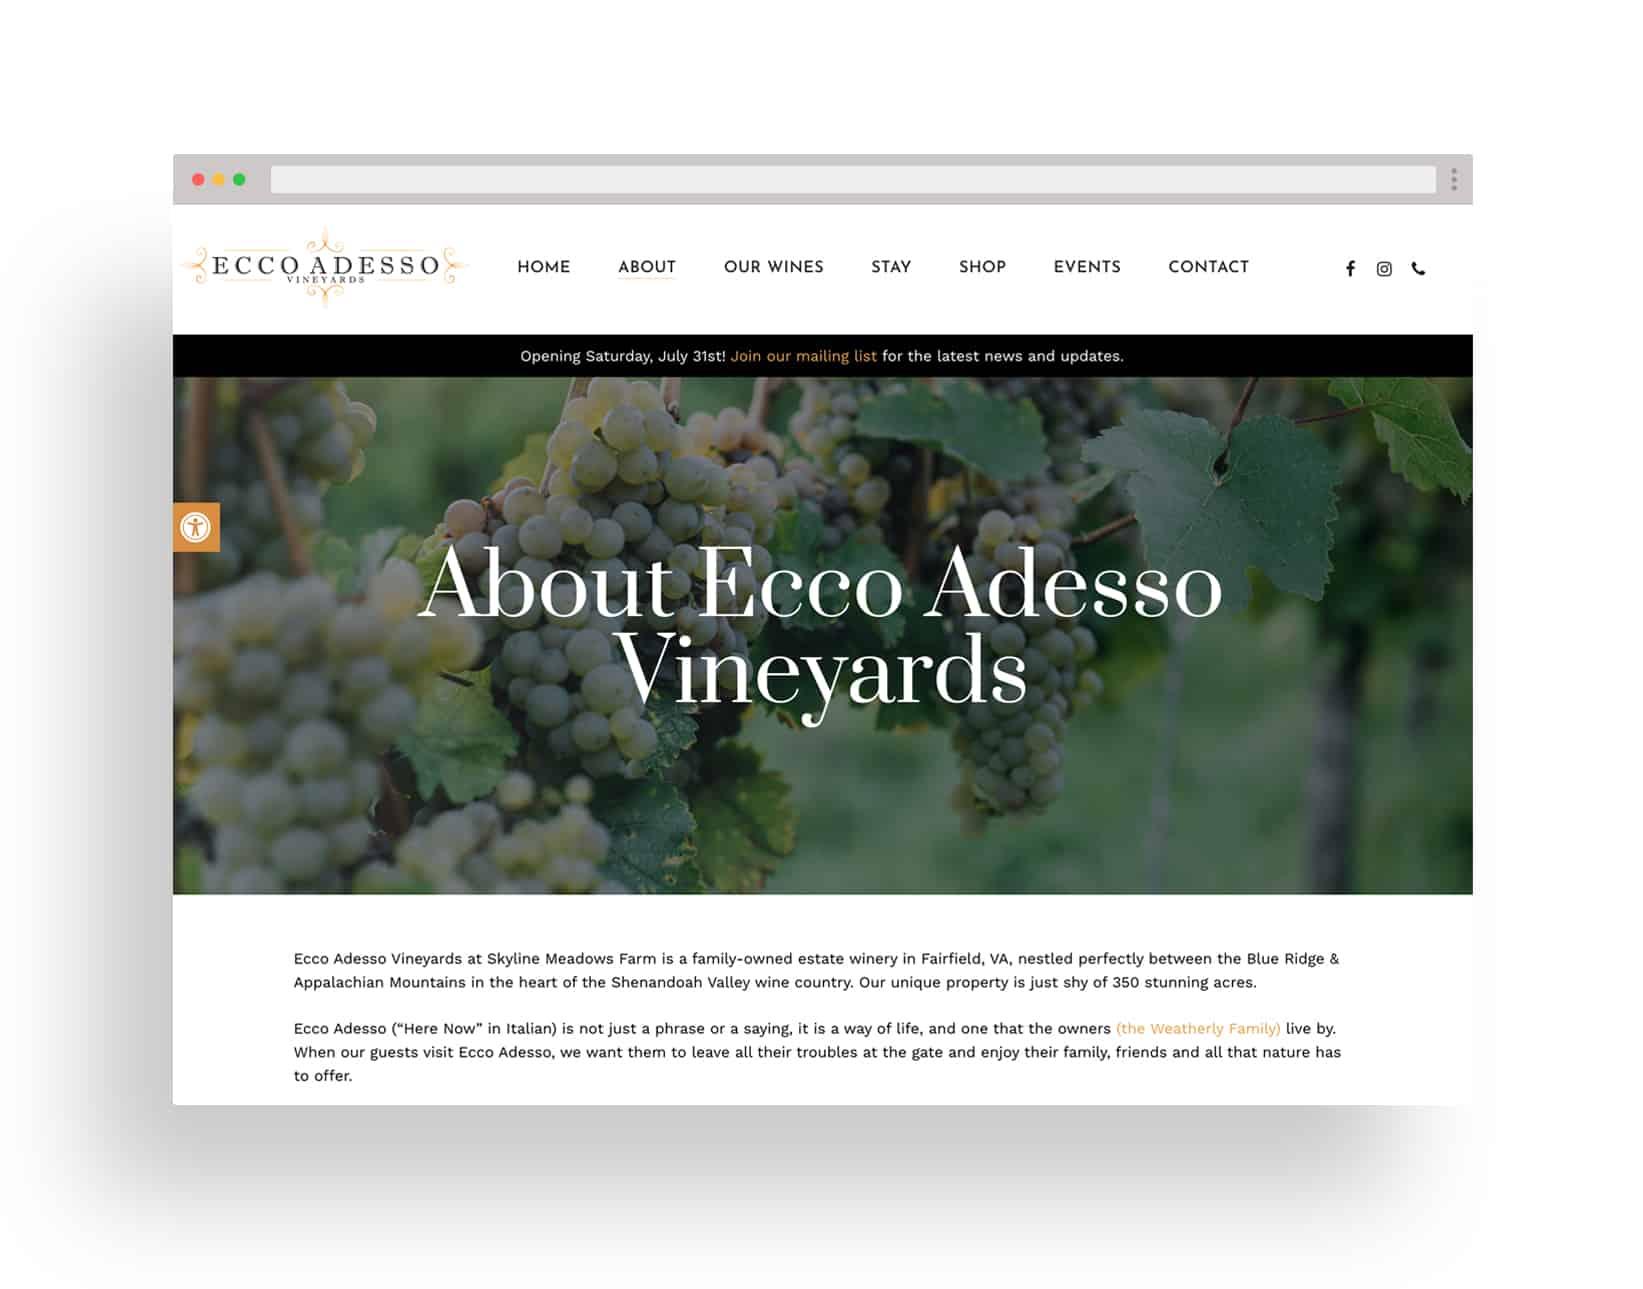 Studio JWAL Web Design Client - Ecco Adesso Vineyards